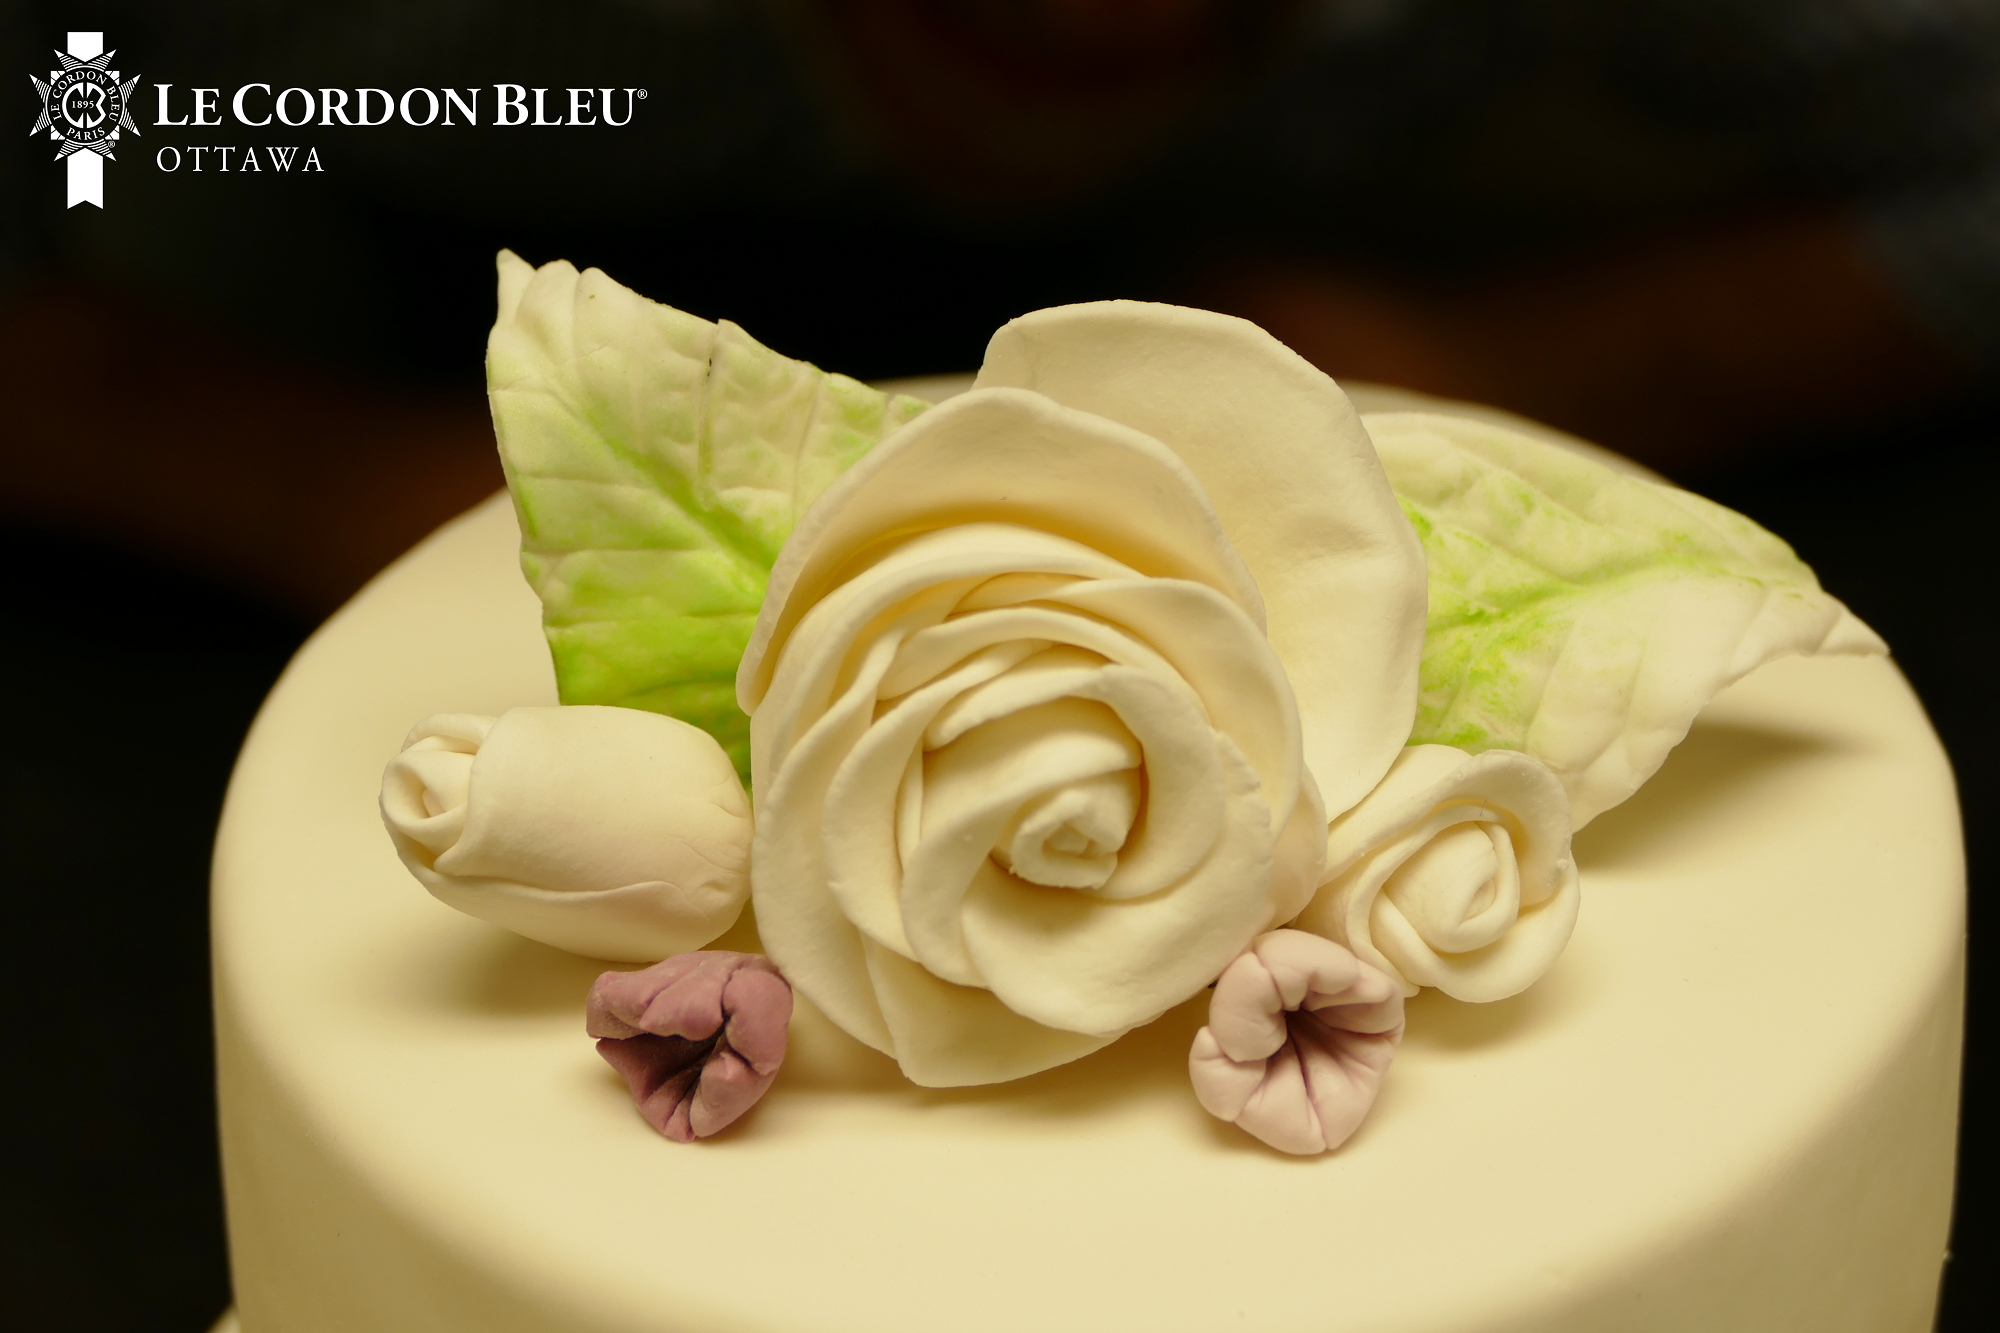 Floral Wedding Cake Decor Student Work Cake Decorating Floral Wedding Cake Confectionary